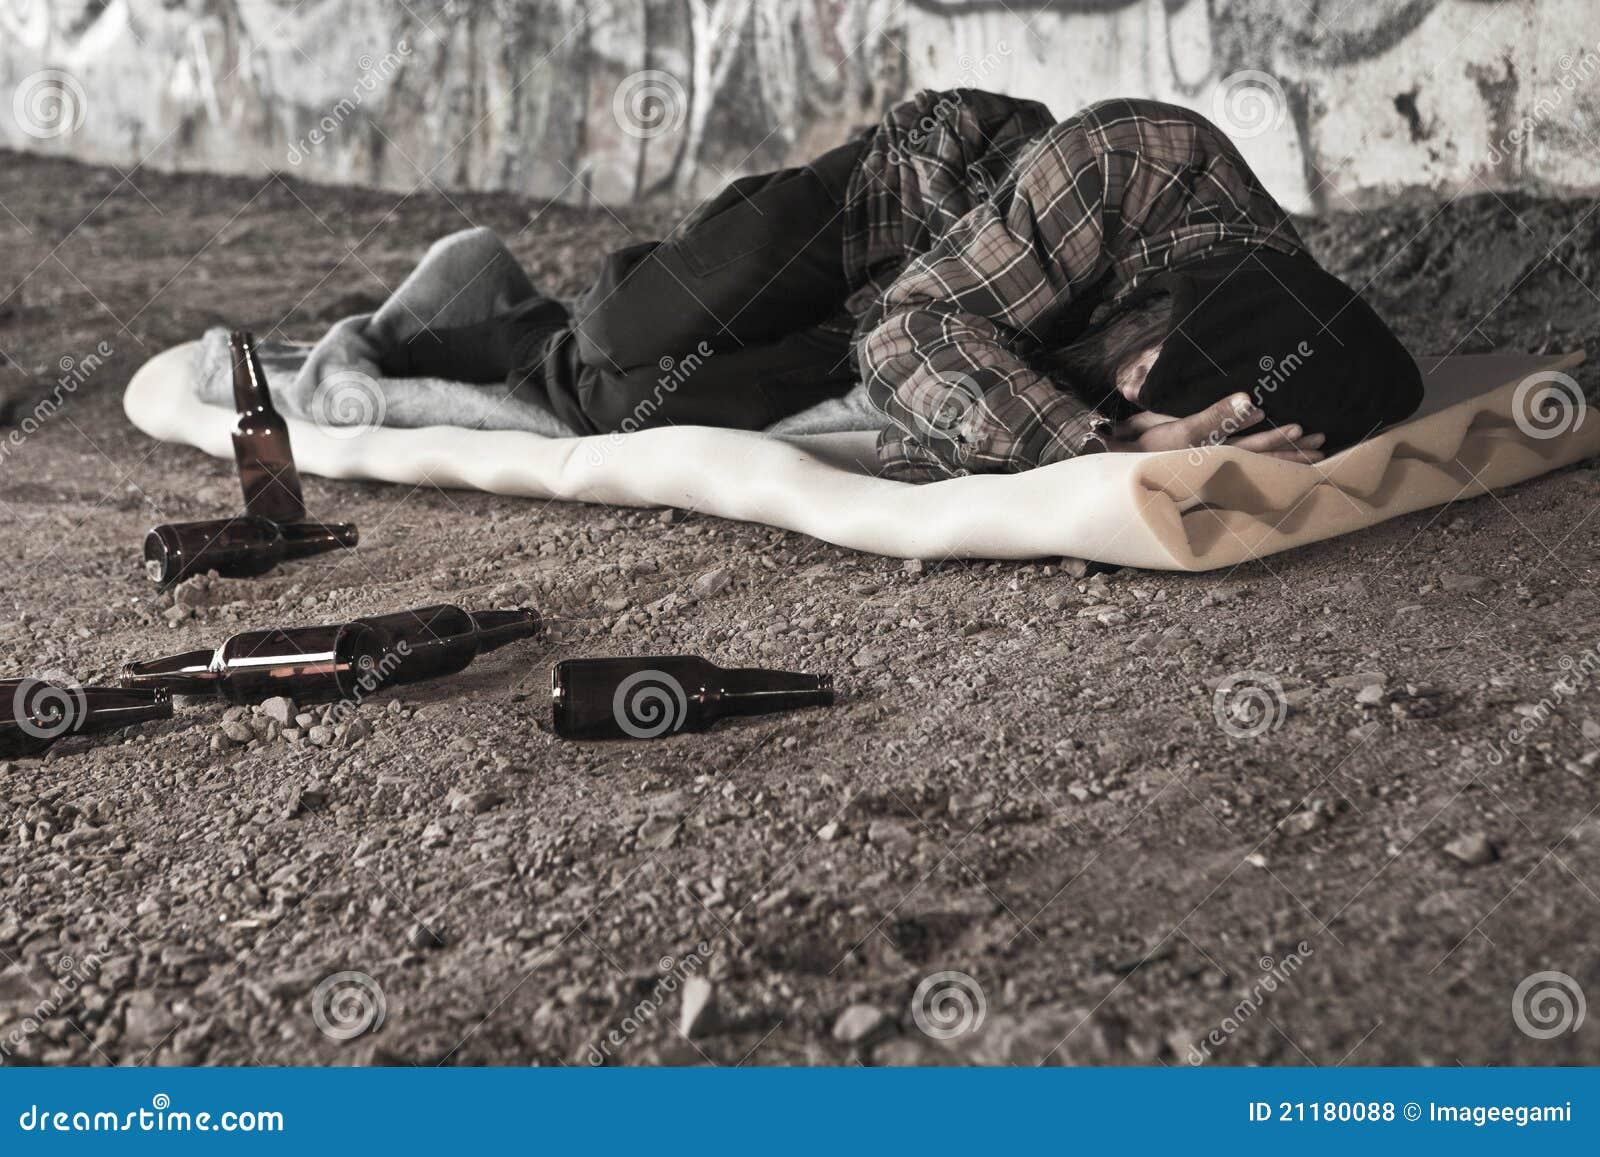 Homeless alcoholic man